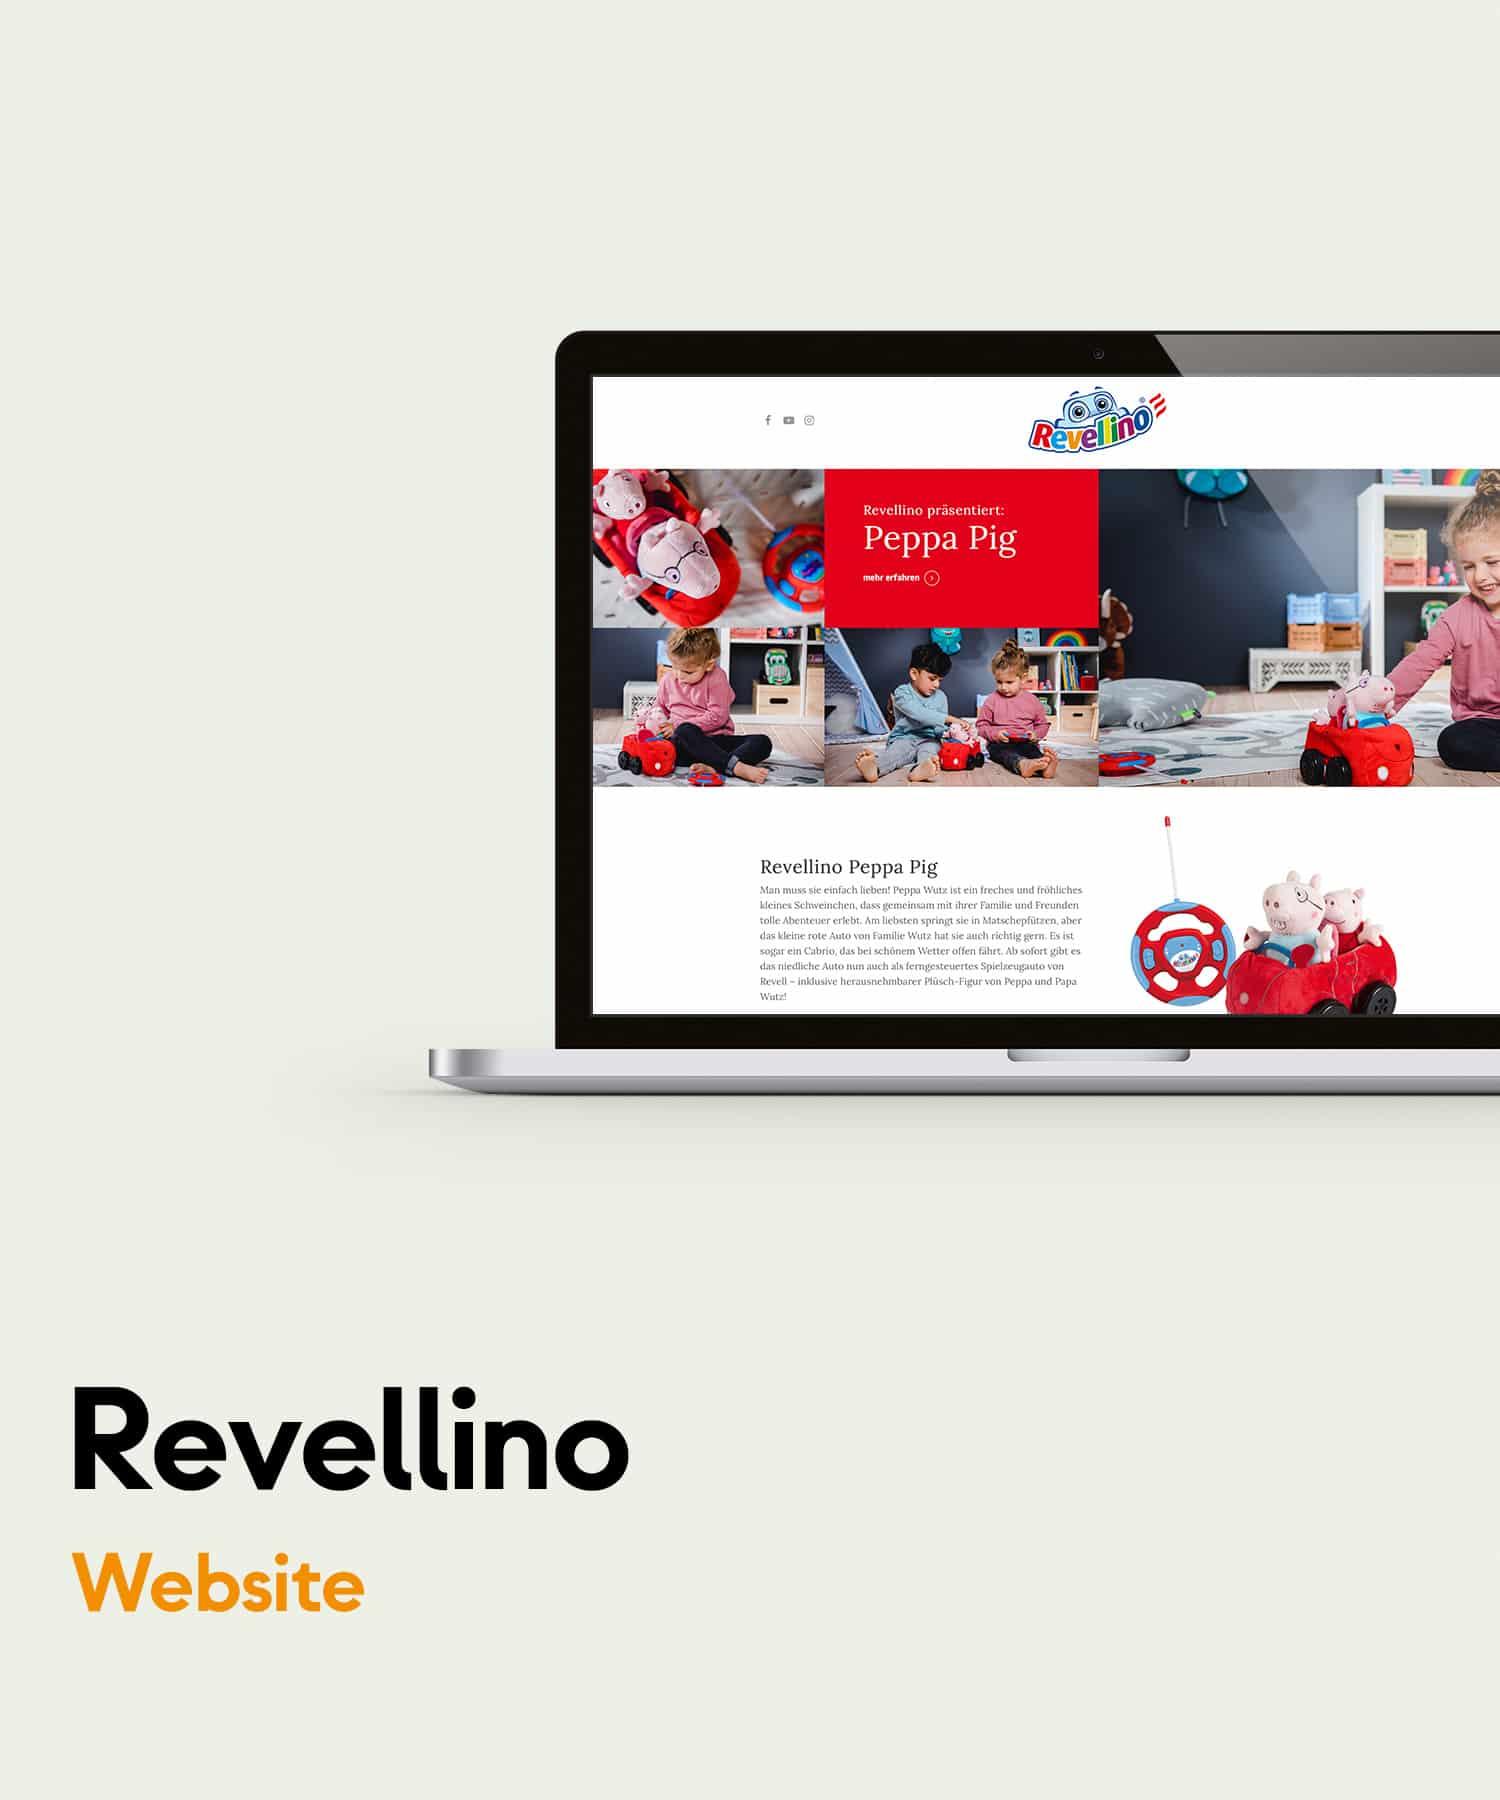 Revellino